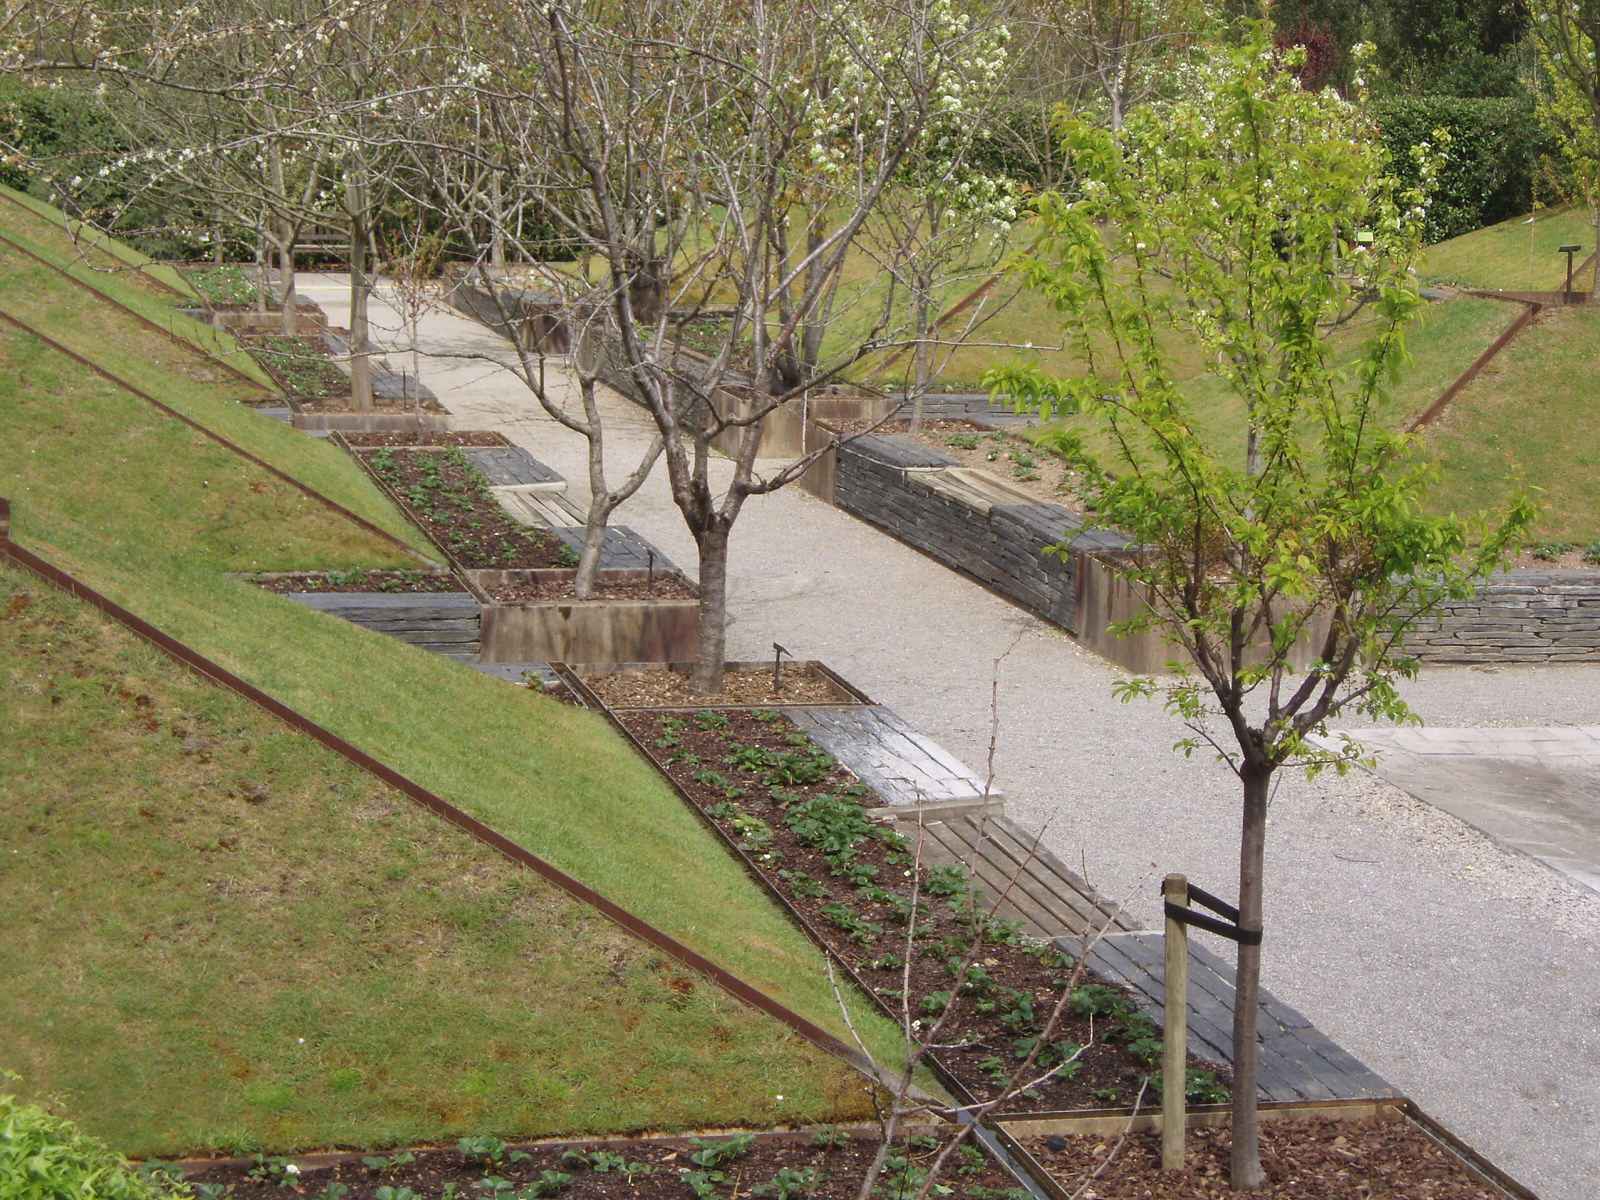 Metido en jardines poda de rboles frutales iii poda de for Arboles frutales para jardin